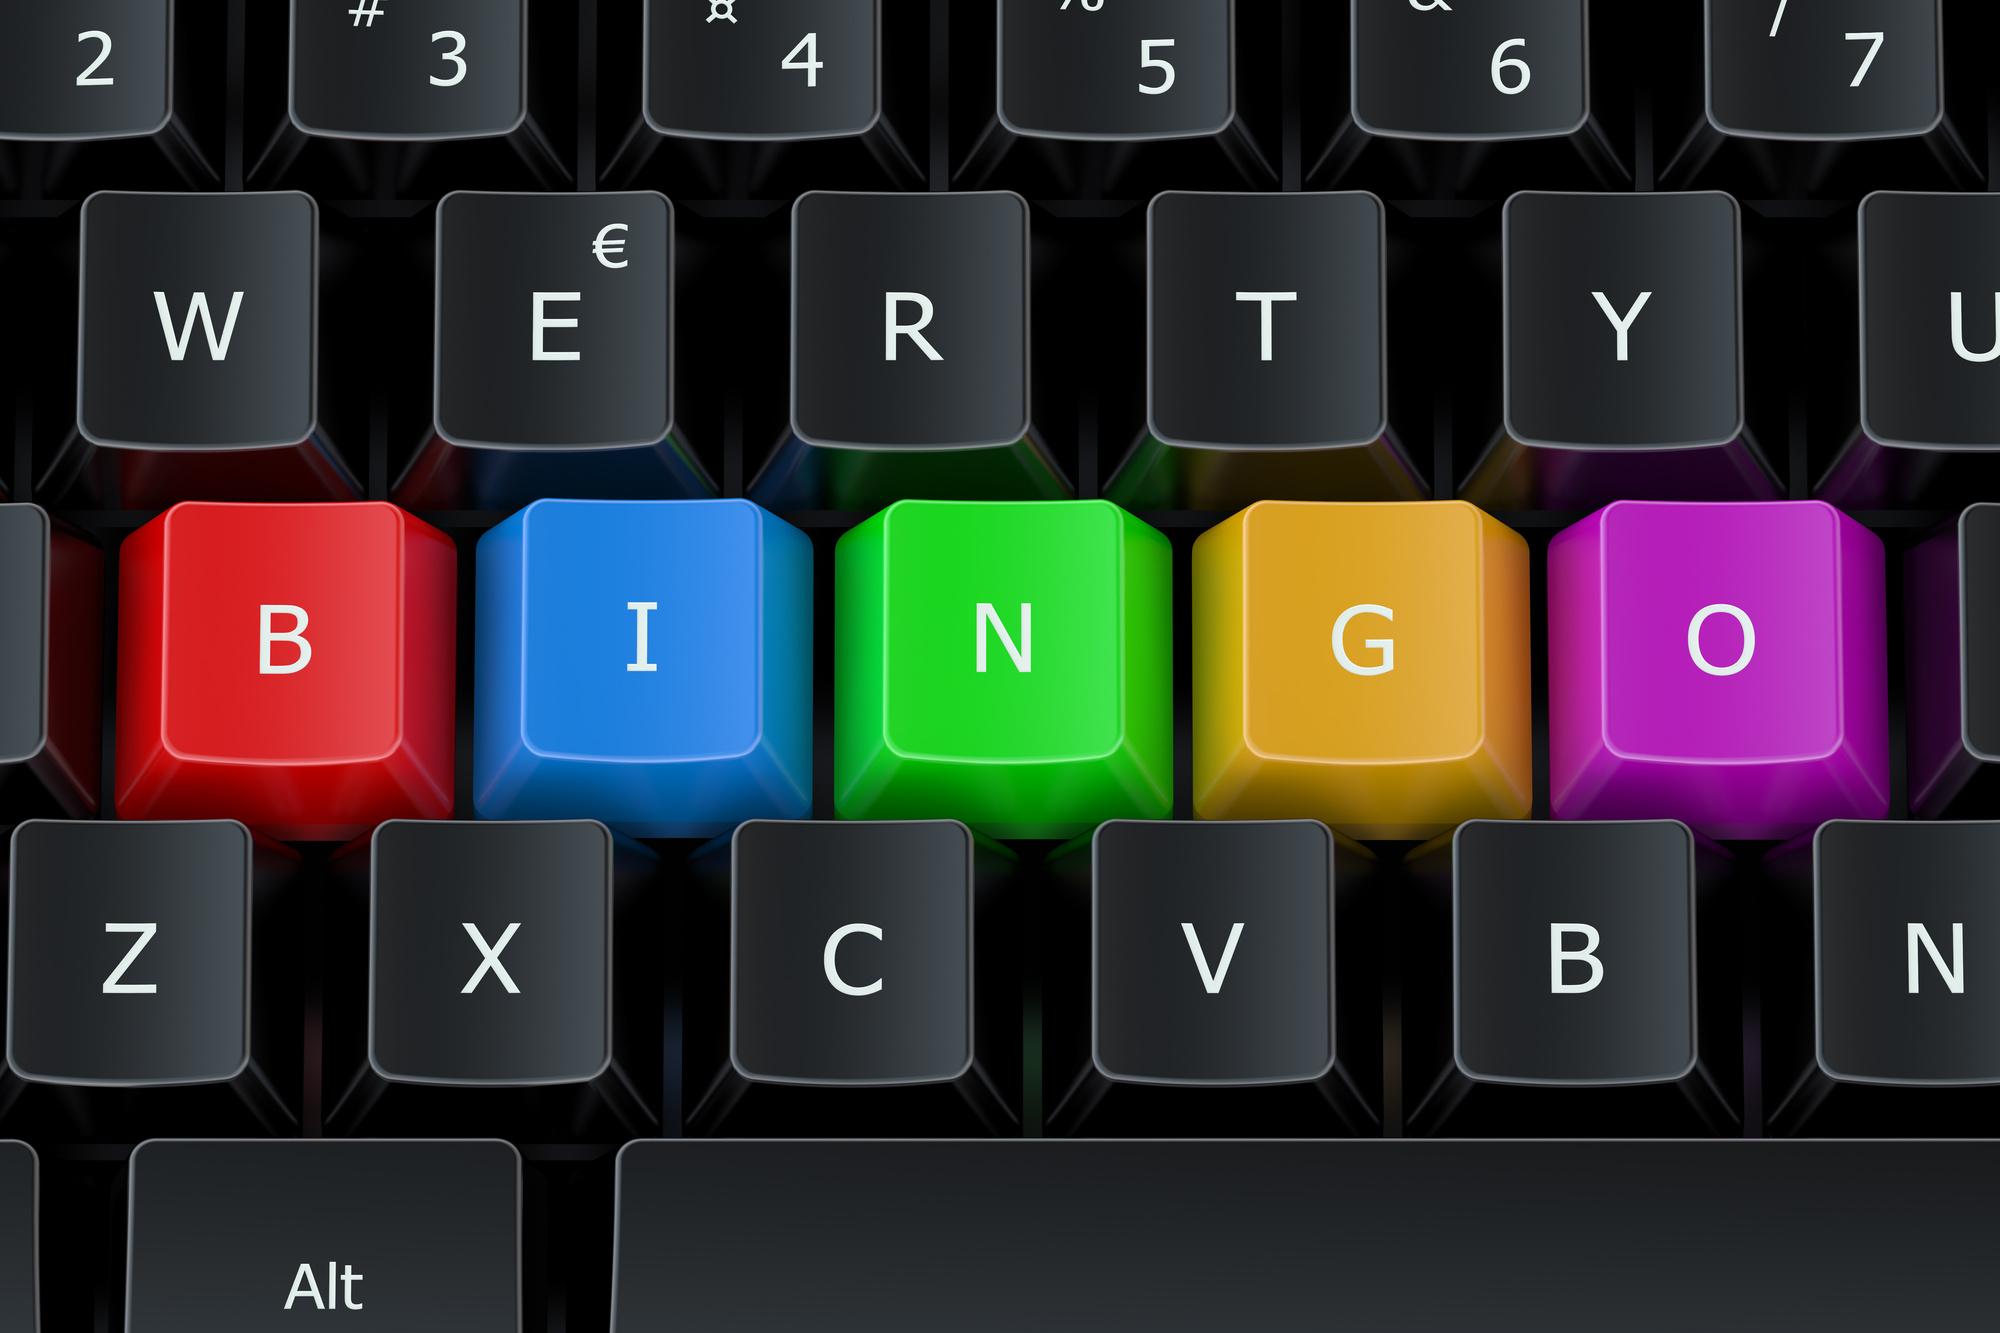 Bingo concept on the computer keyboard